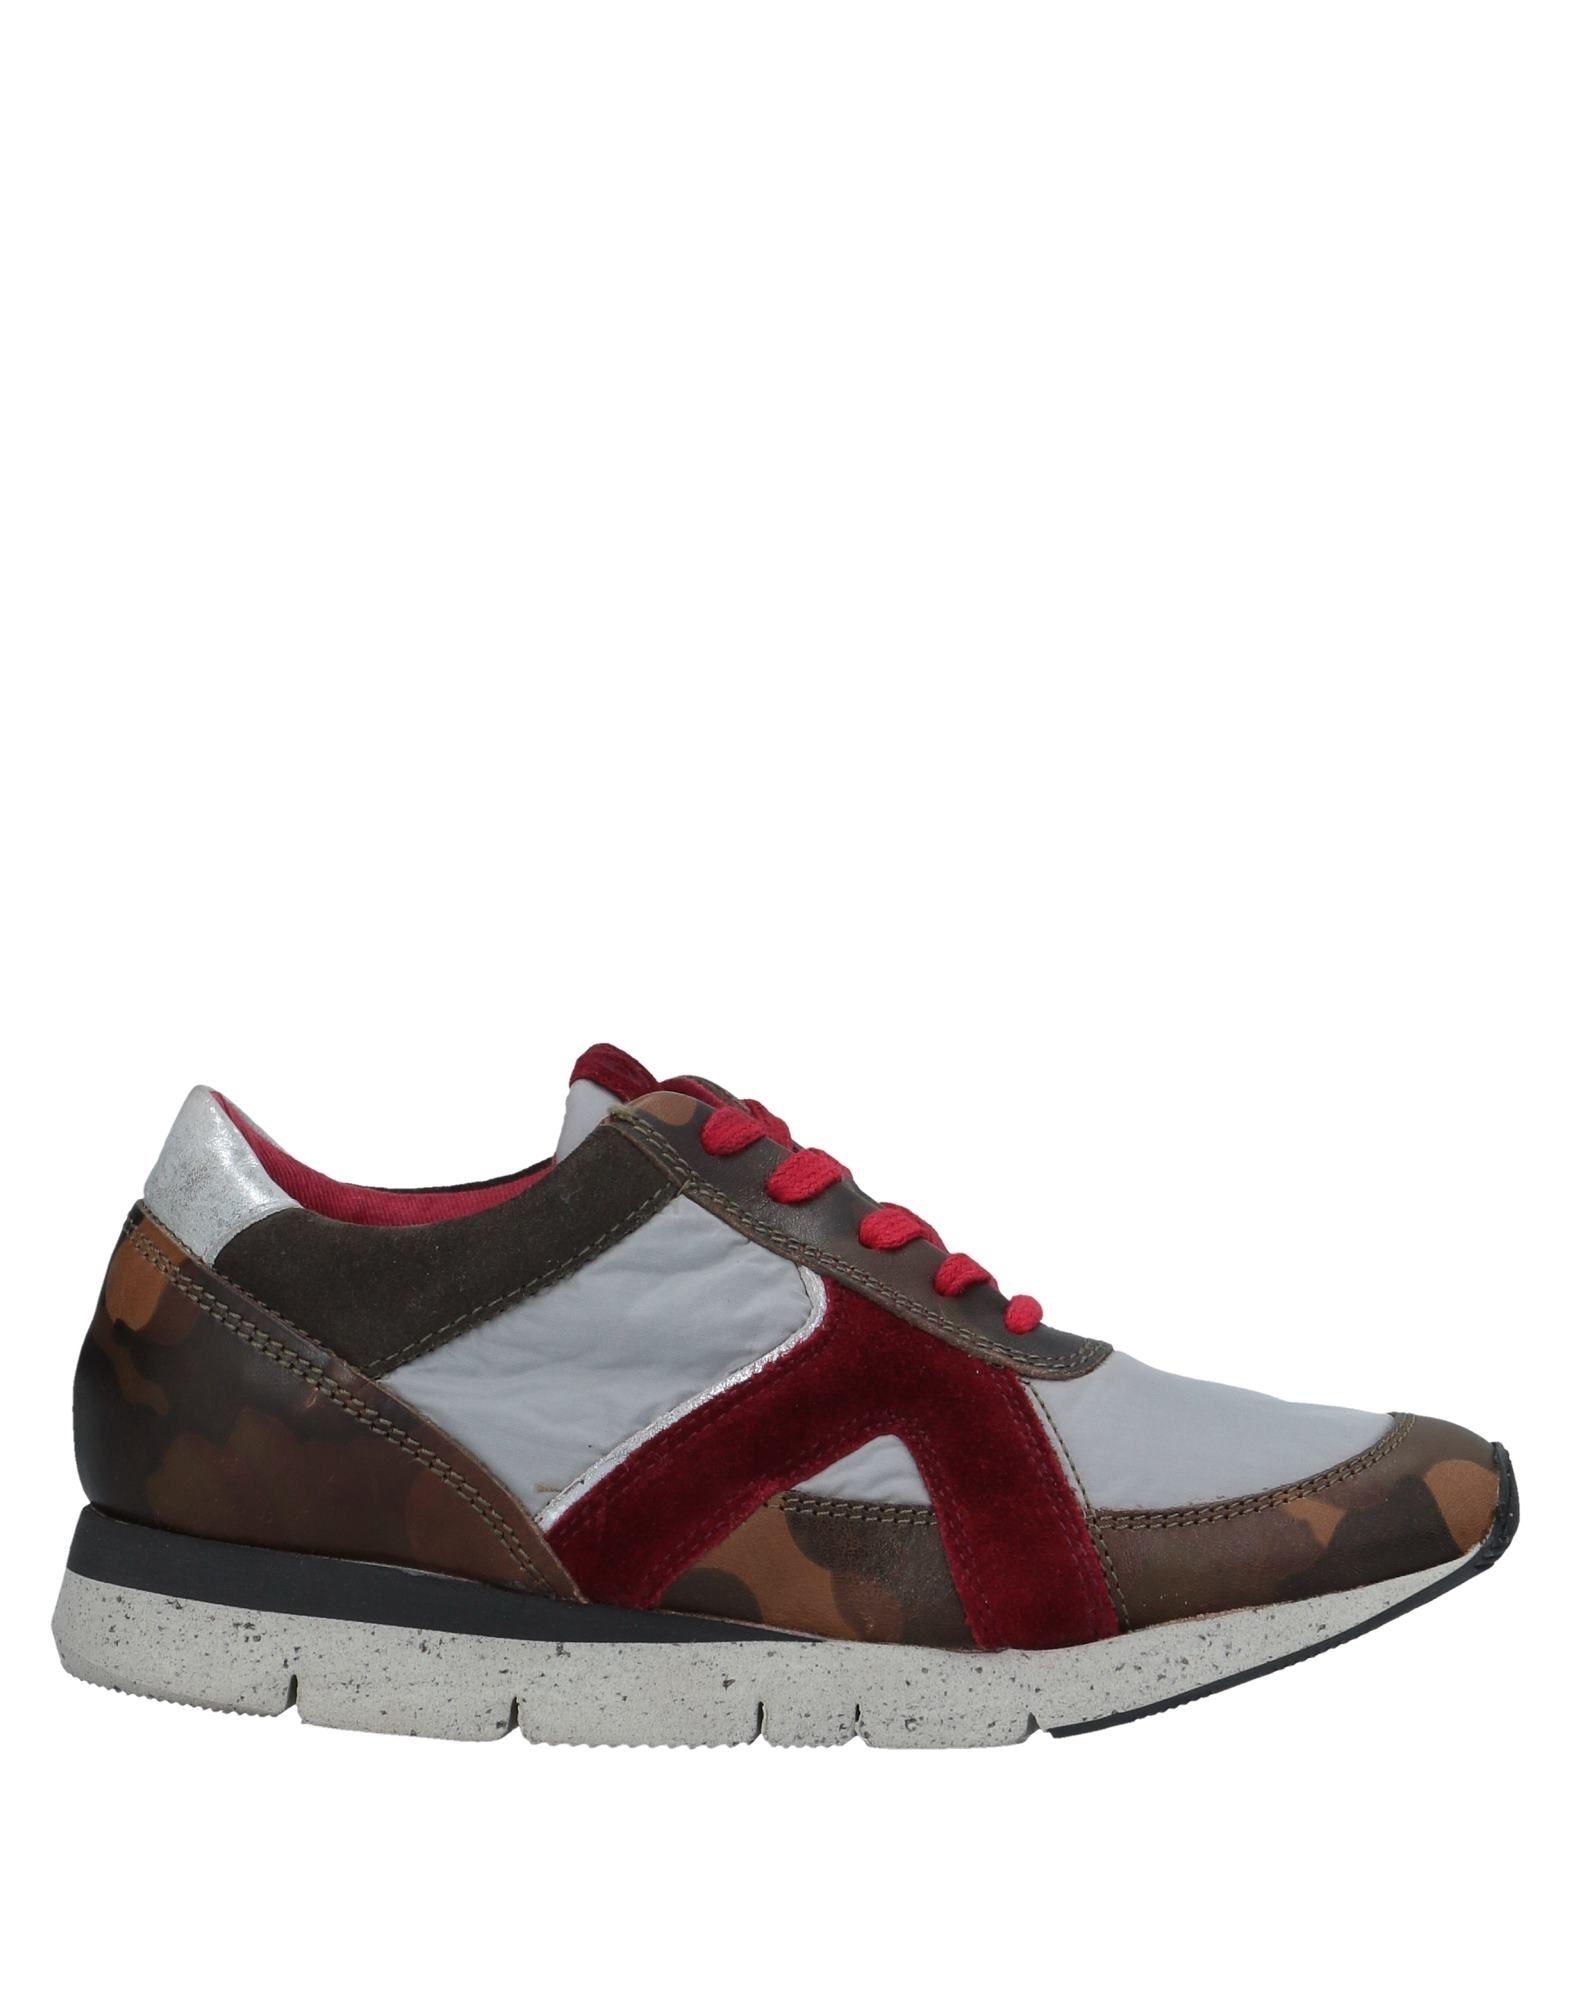 Sneakers O.X.S. Donna - 11525407XI elegante